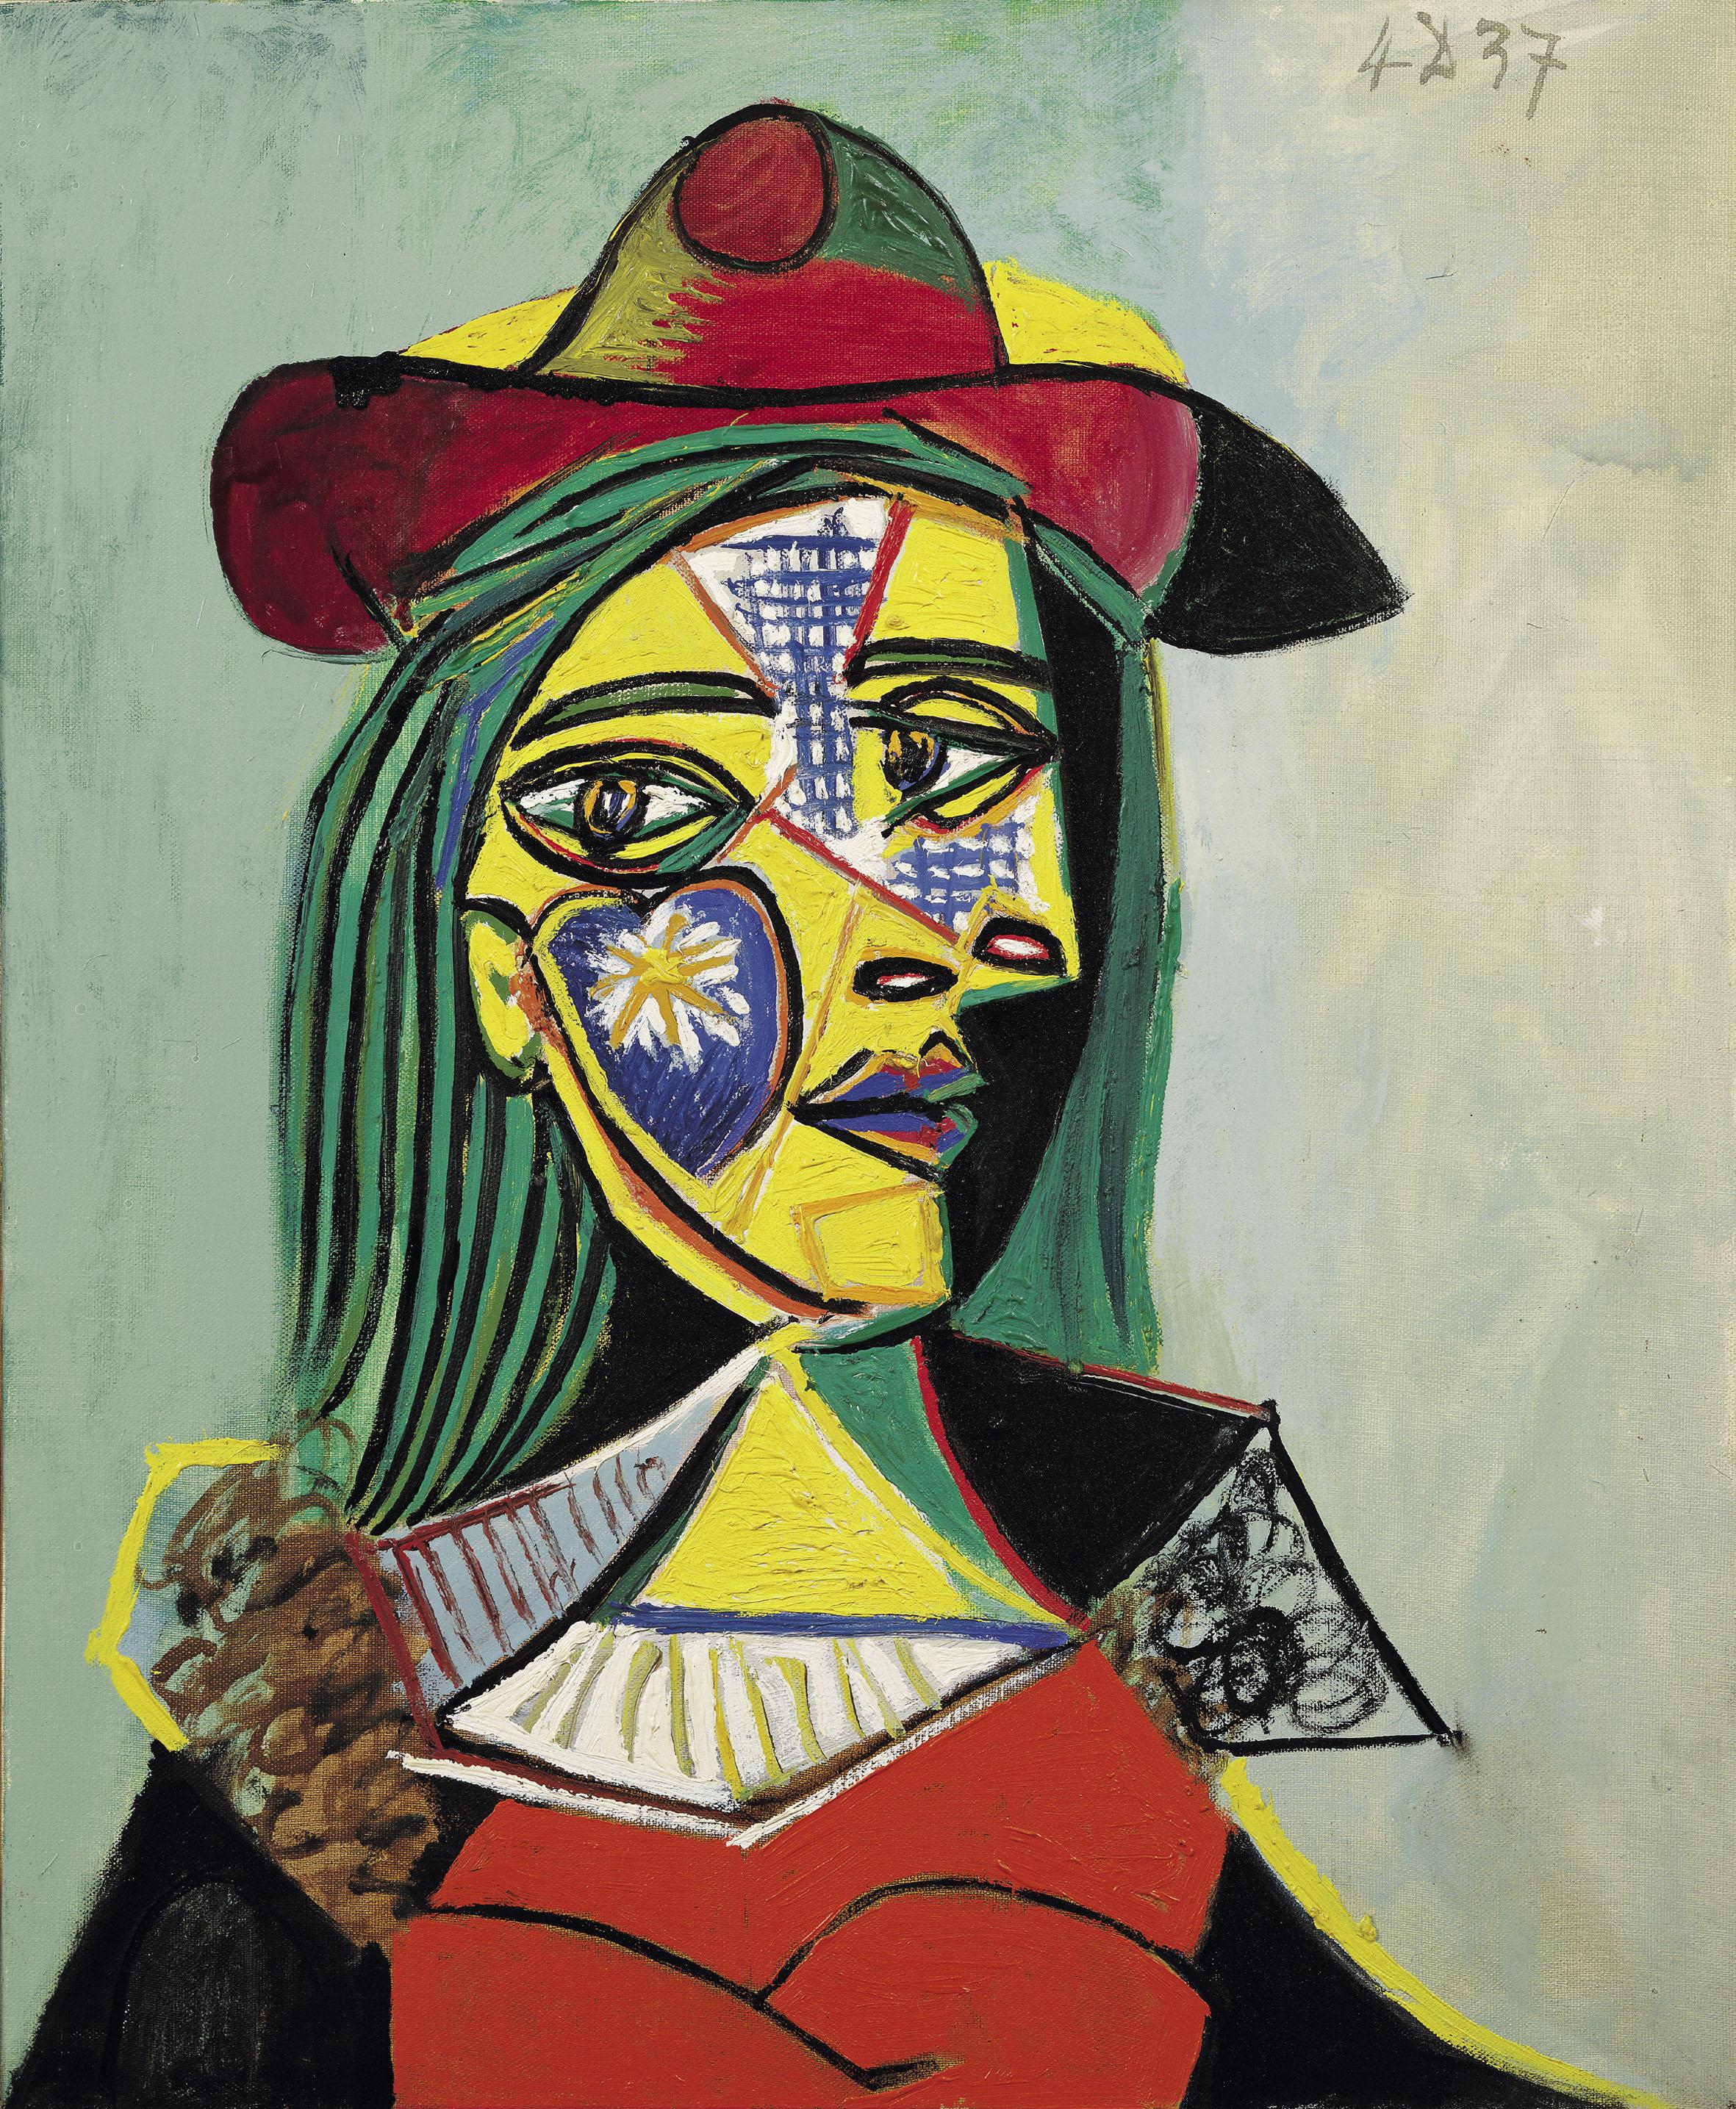 Pablo Picasso - Dona amb barret i coll de pell (Marie-Thérèse Walter) - París, 4 de desembre de 1937